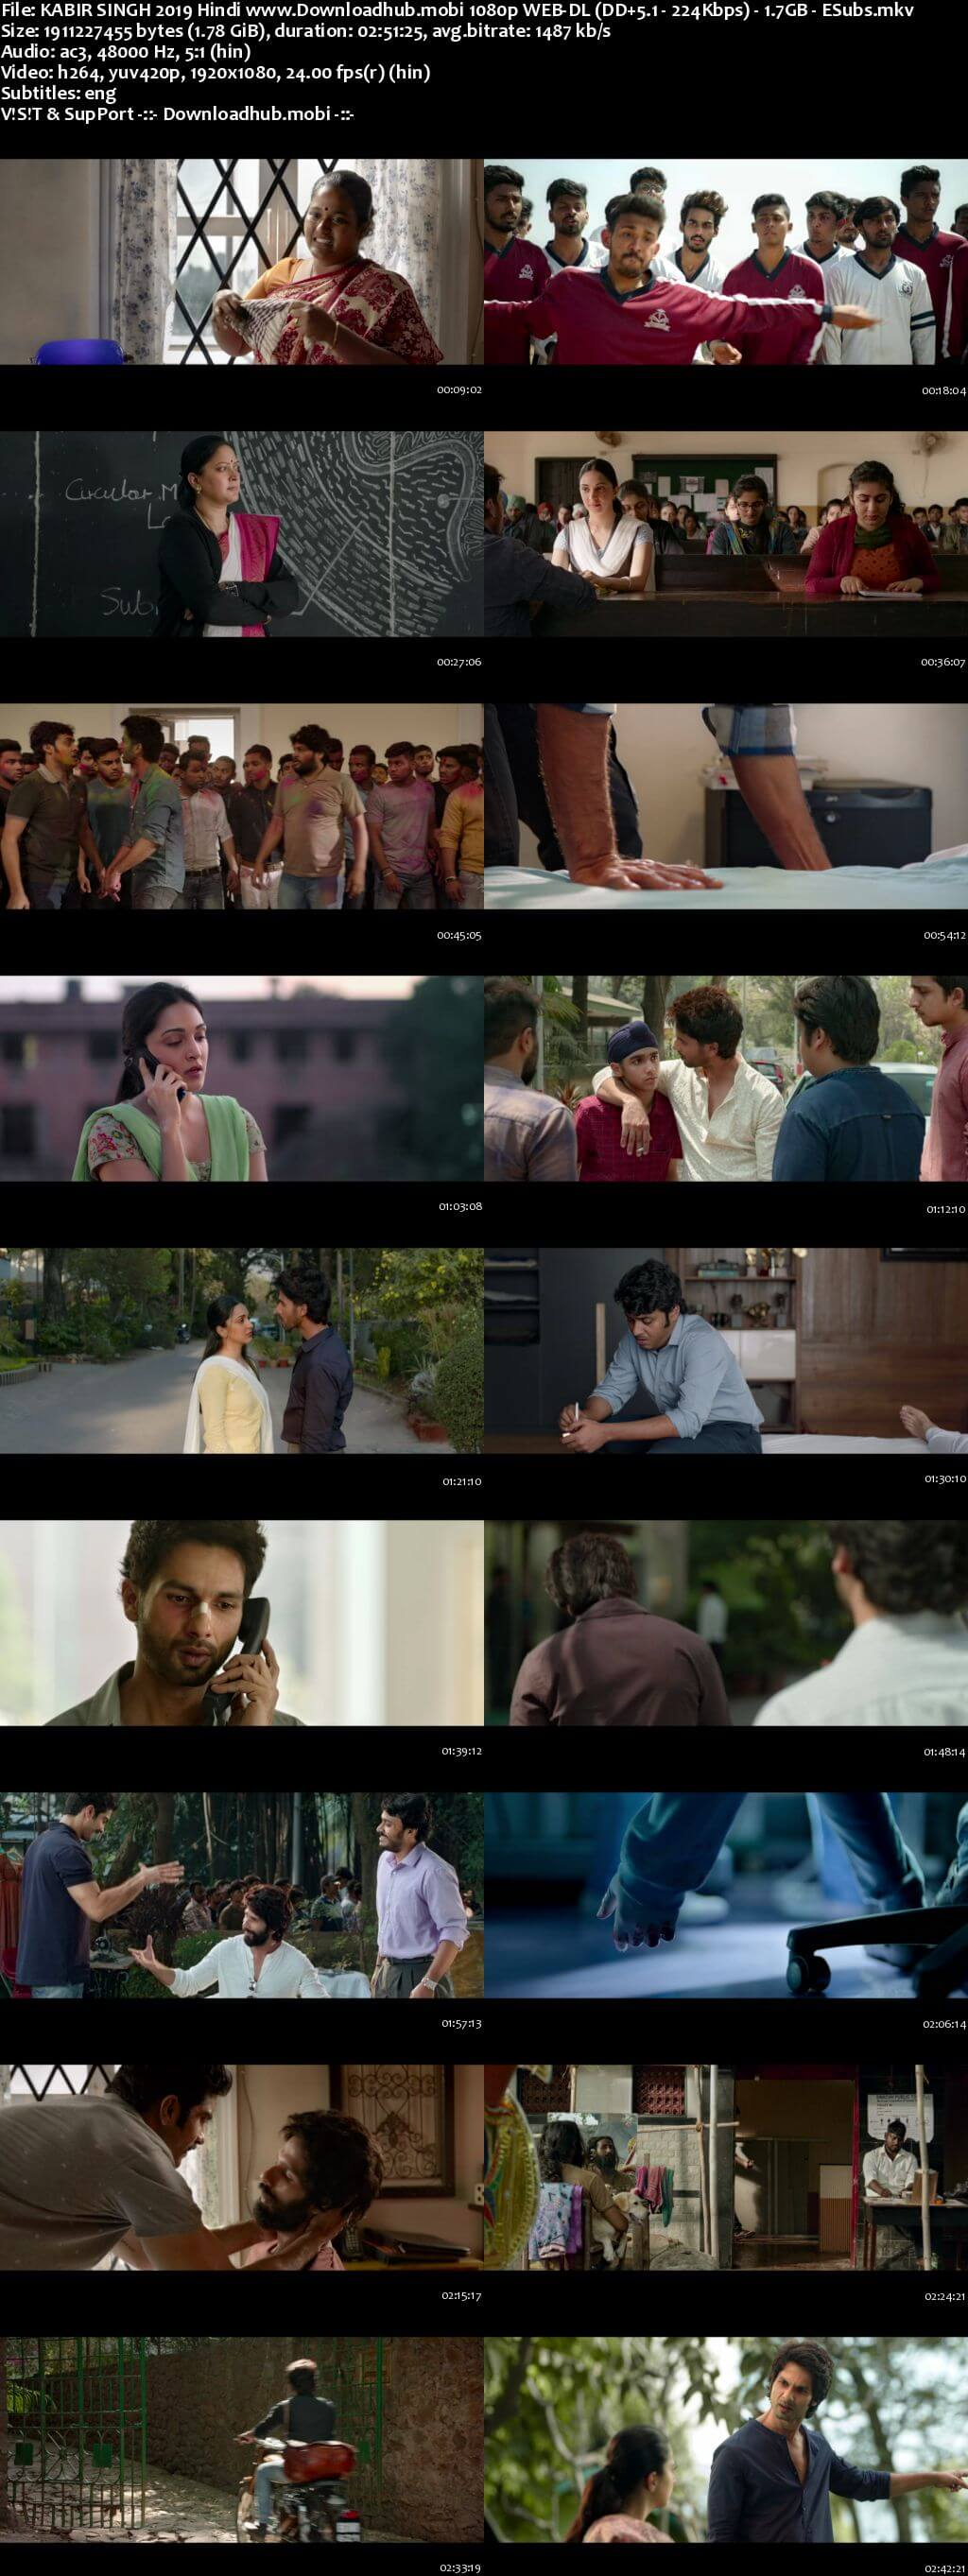 Kabir Singh 2019 Hindi 1080p HDRip ESubs